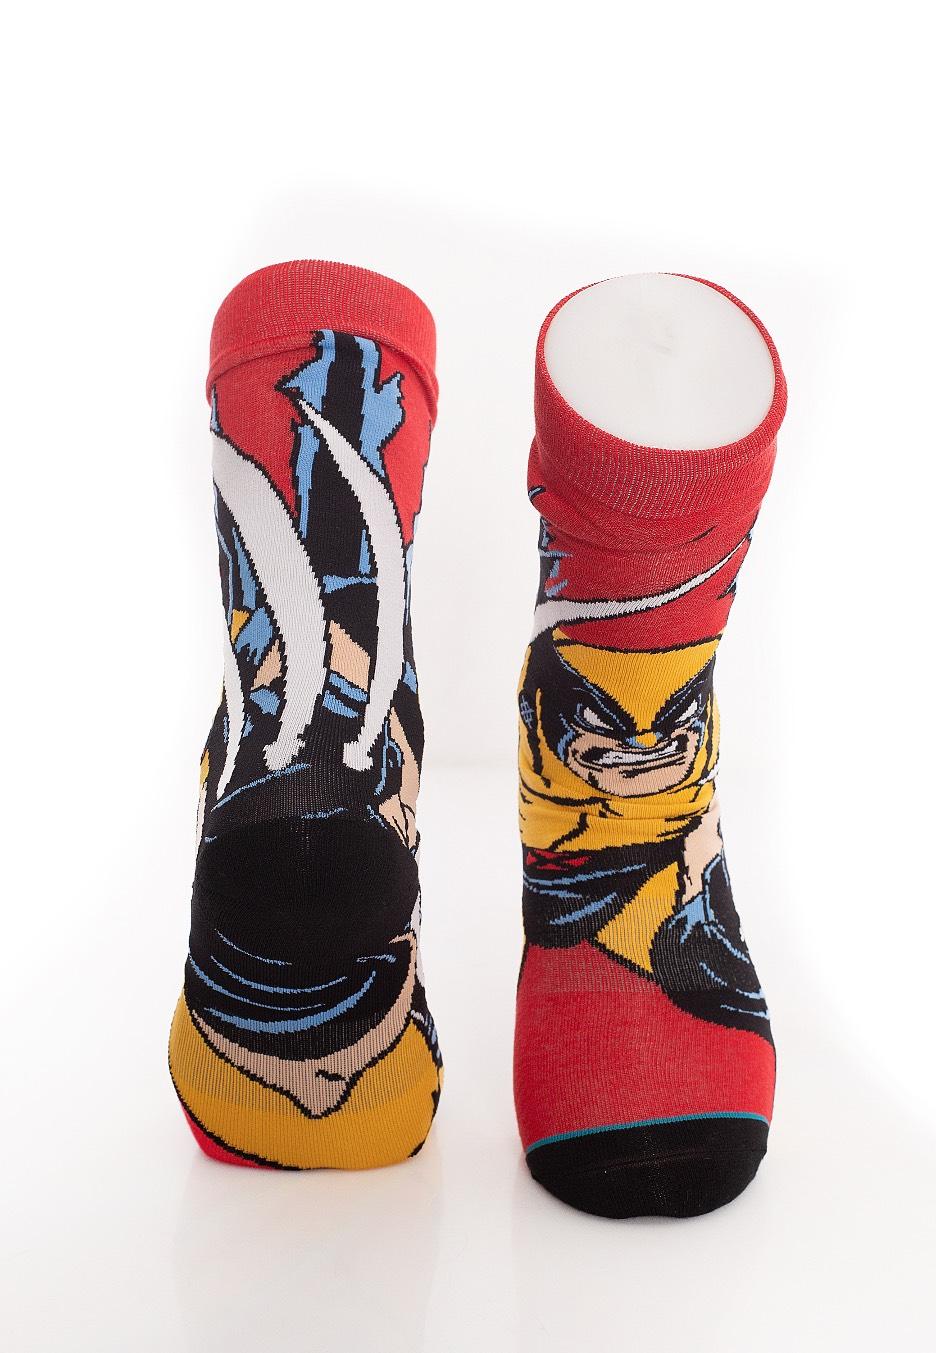 Red BNWT Stance NEW Unisex Xmen Wolverine Socks